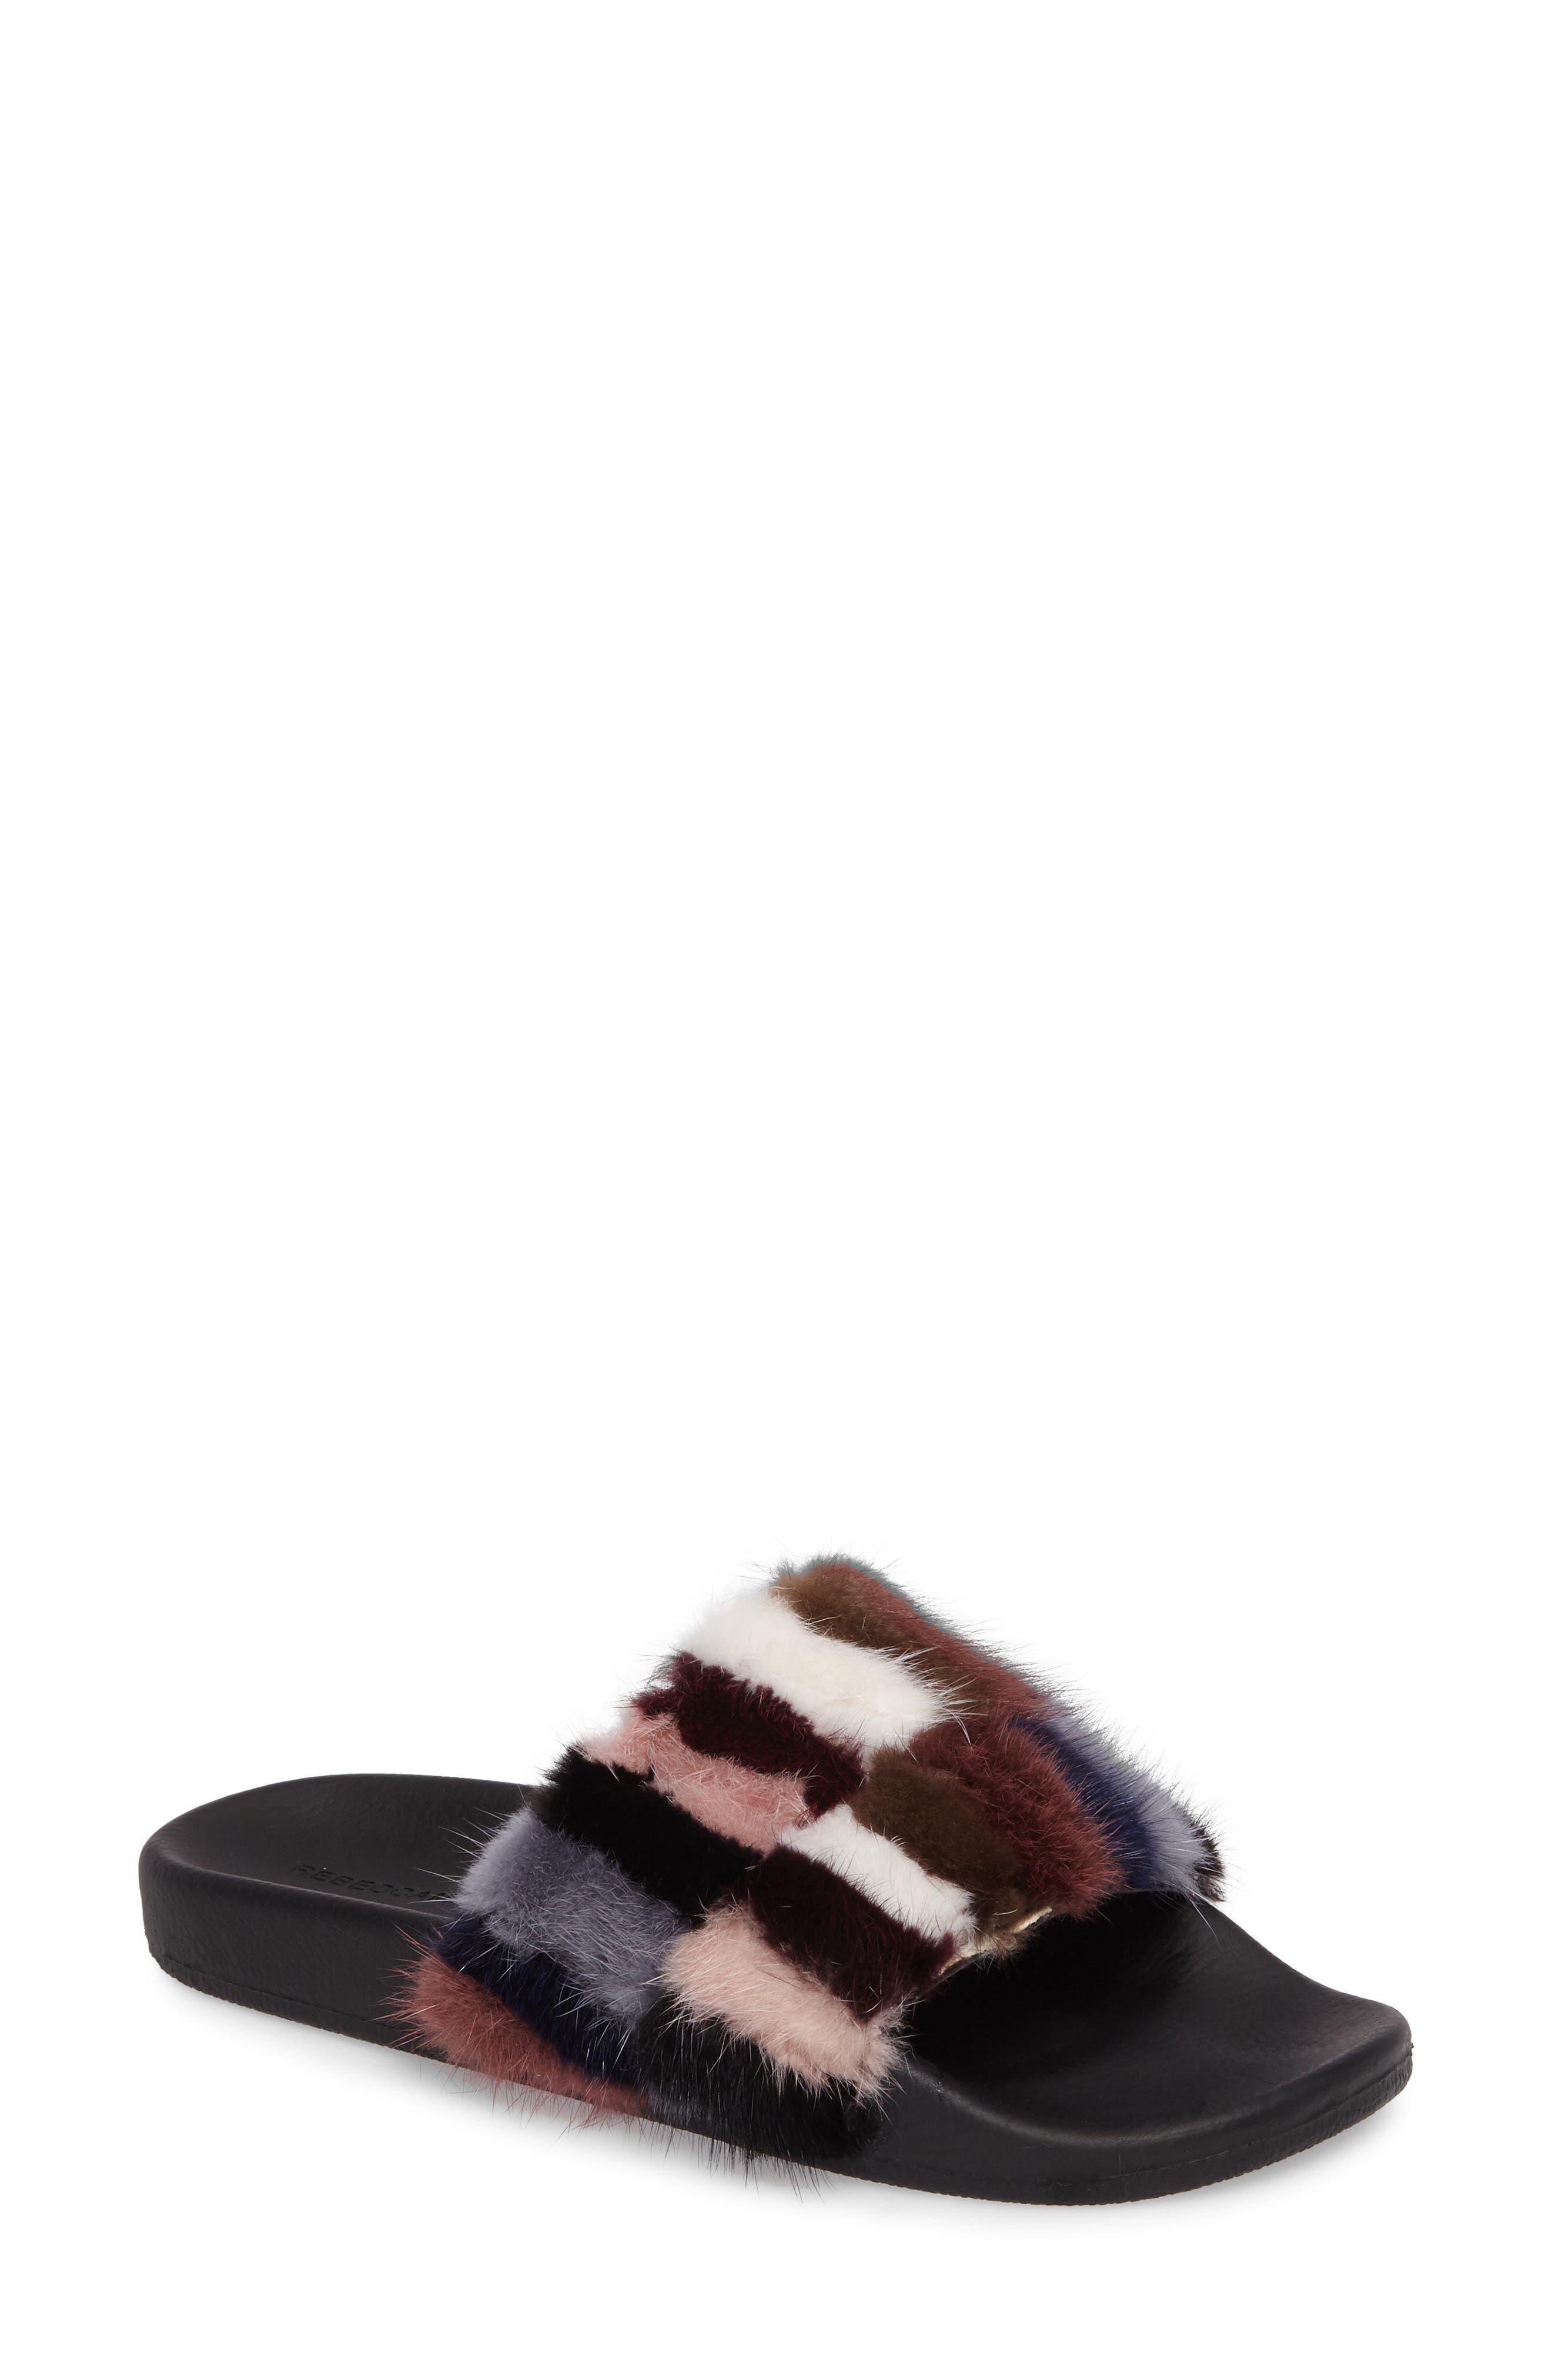 Sammi Genuine Fur Slide Sandal,                         Main,                         color, Multi Fur